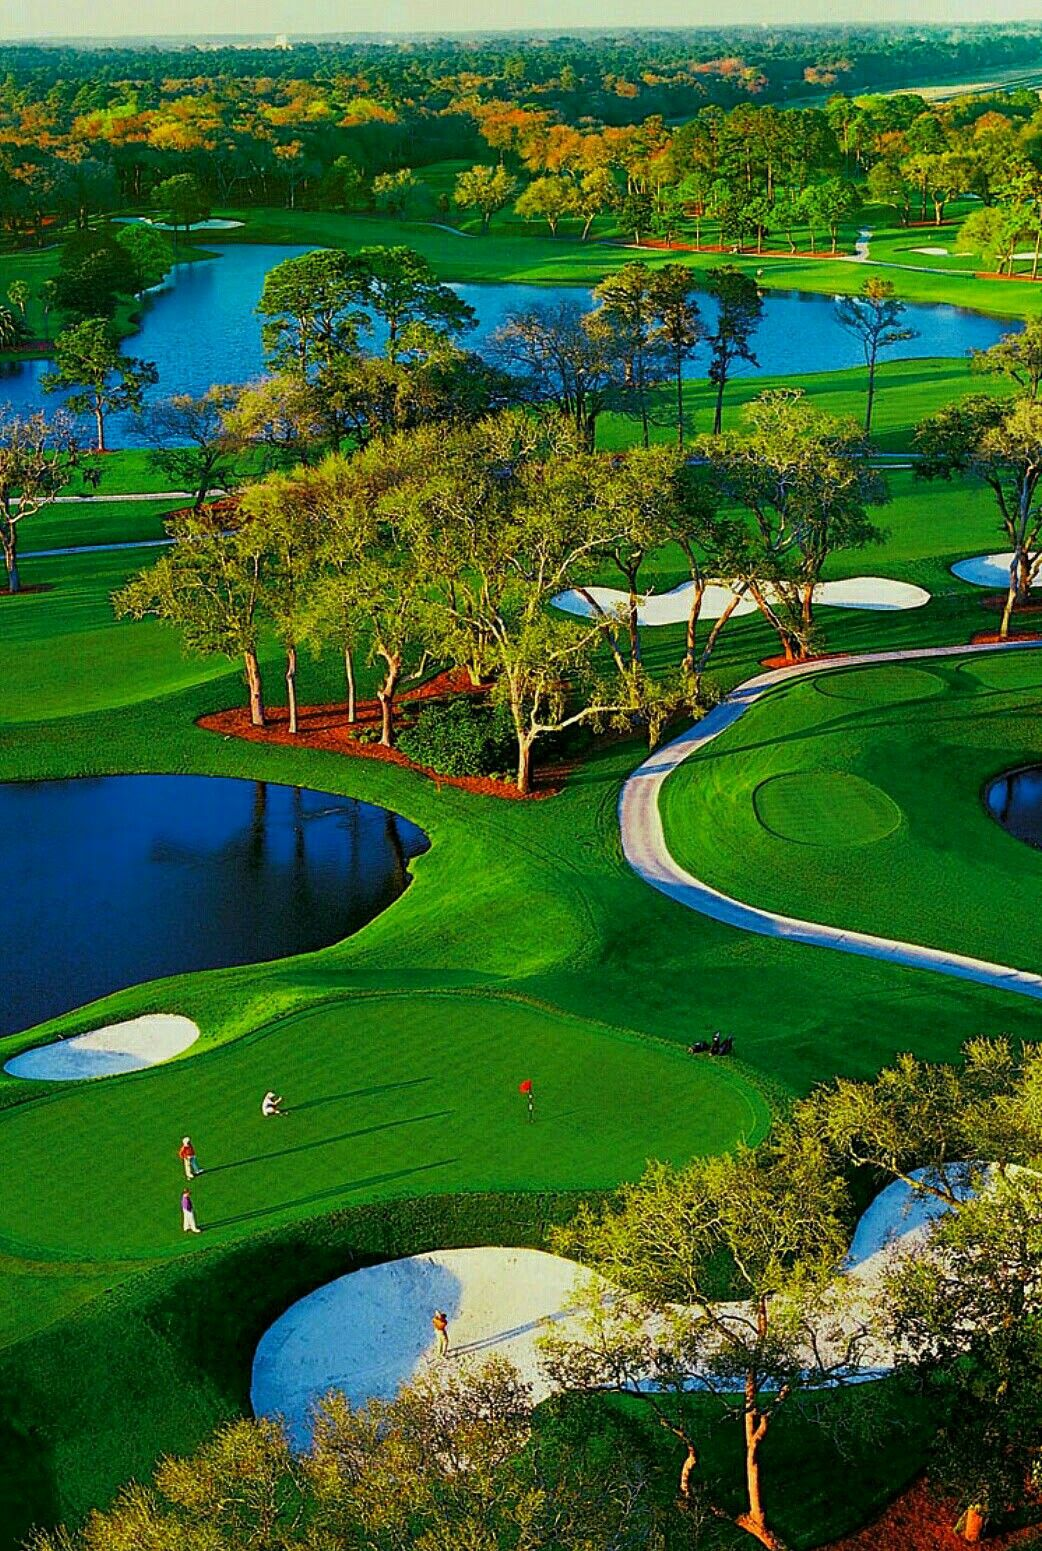 Pin by Gullane Golf Club on Gullane No.1 Course | Courses